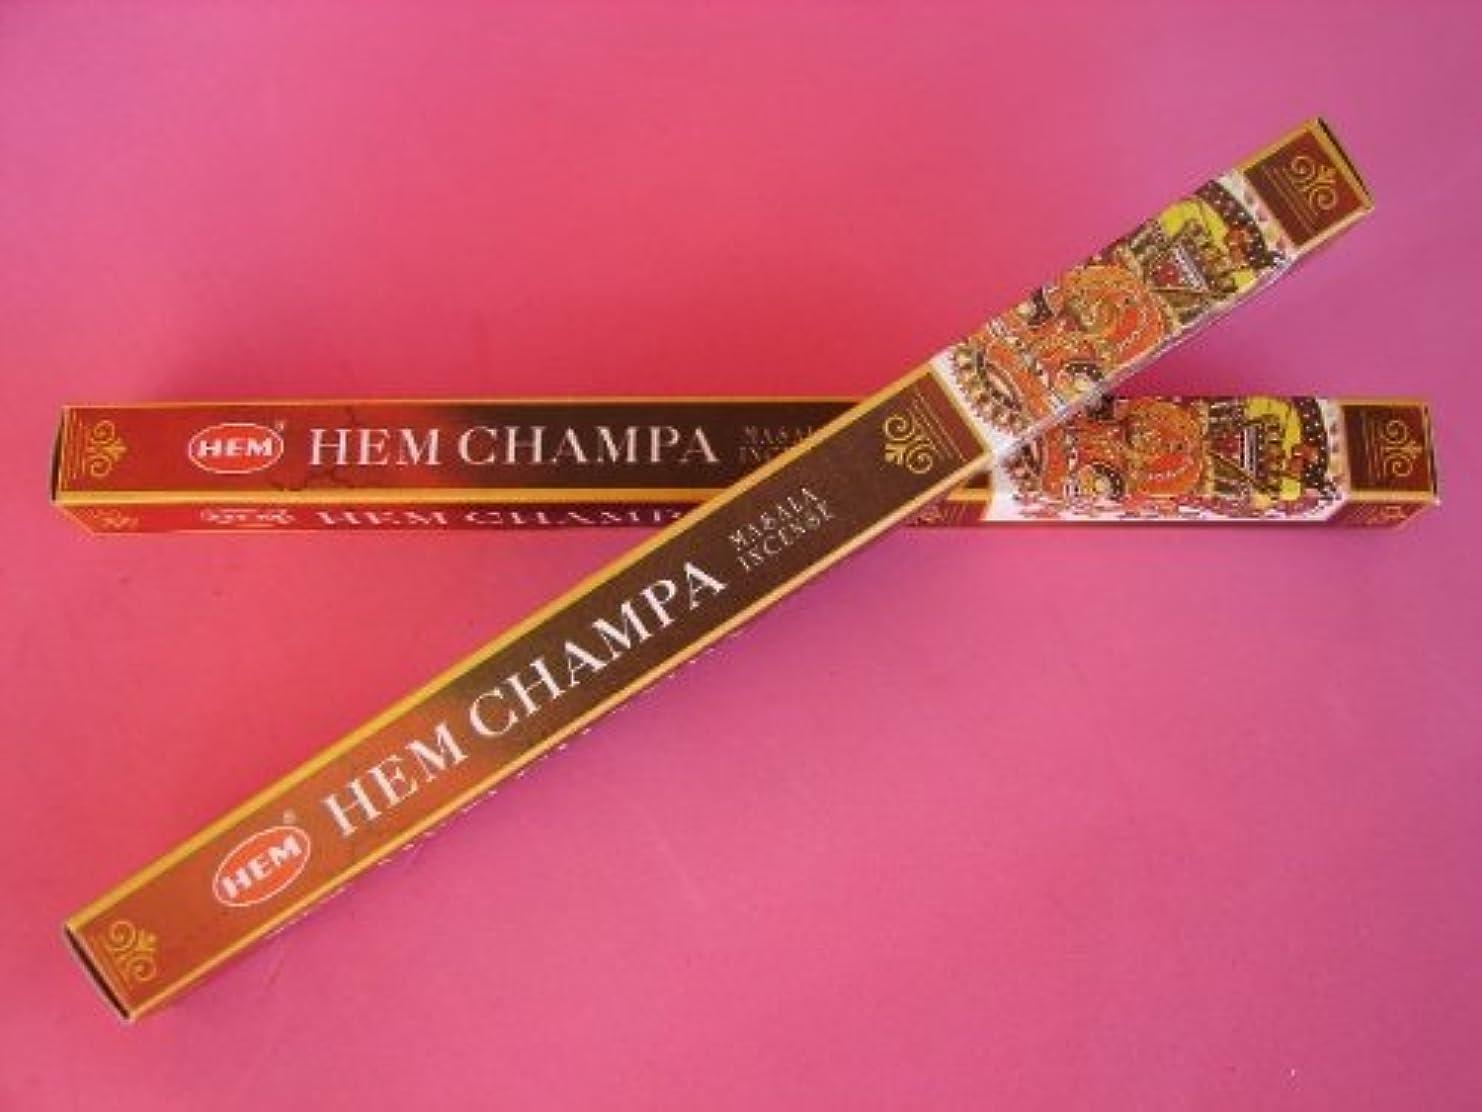 4 Boxes of HEM CHAMPA Incense Sticks